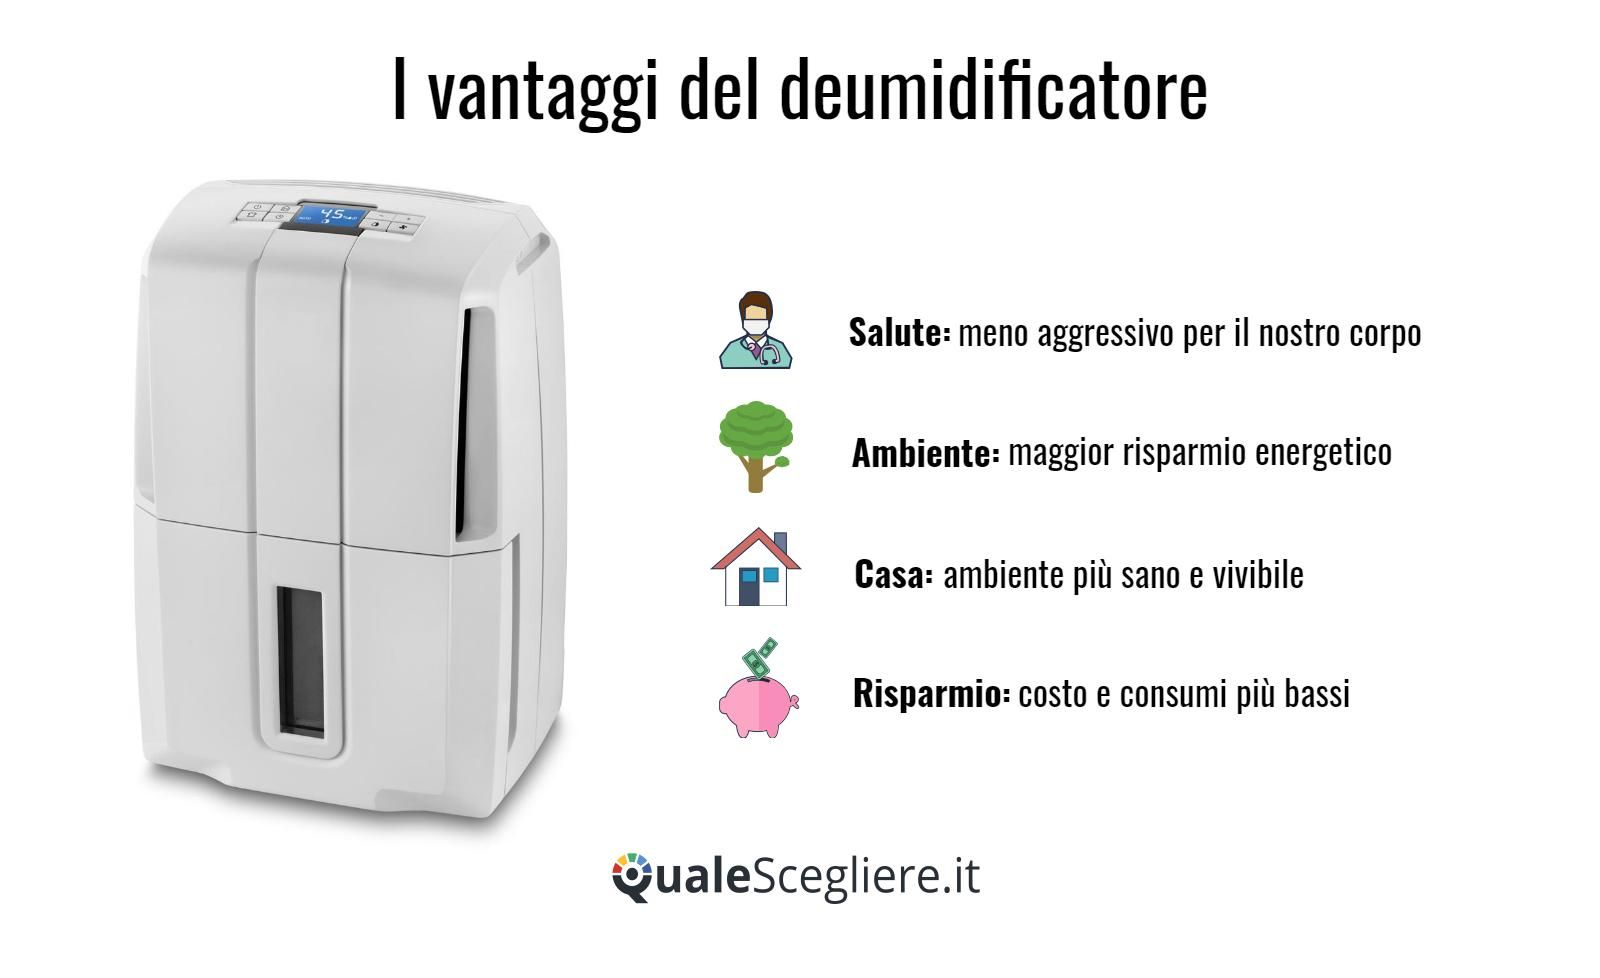 https://www.qualescegliere.it/wp-content/uploads/2014/02/vantaggi-del-deumidificatore.jpeg